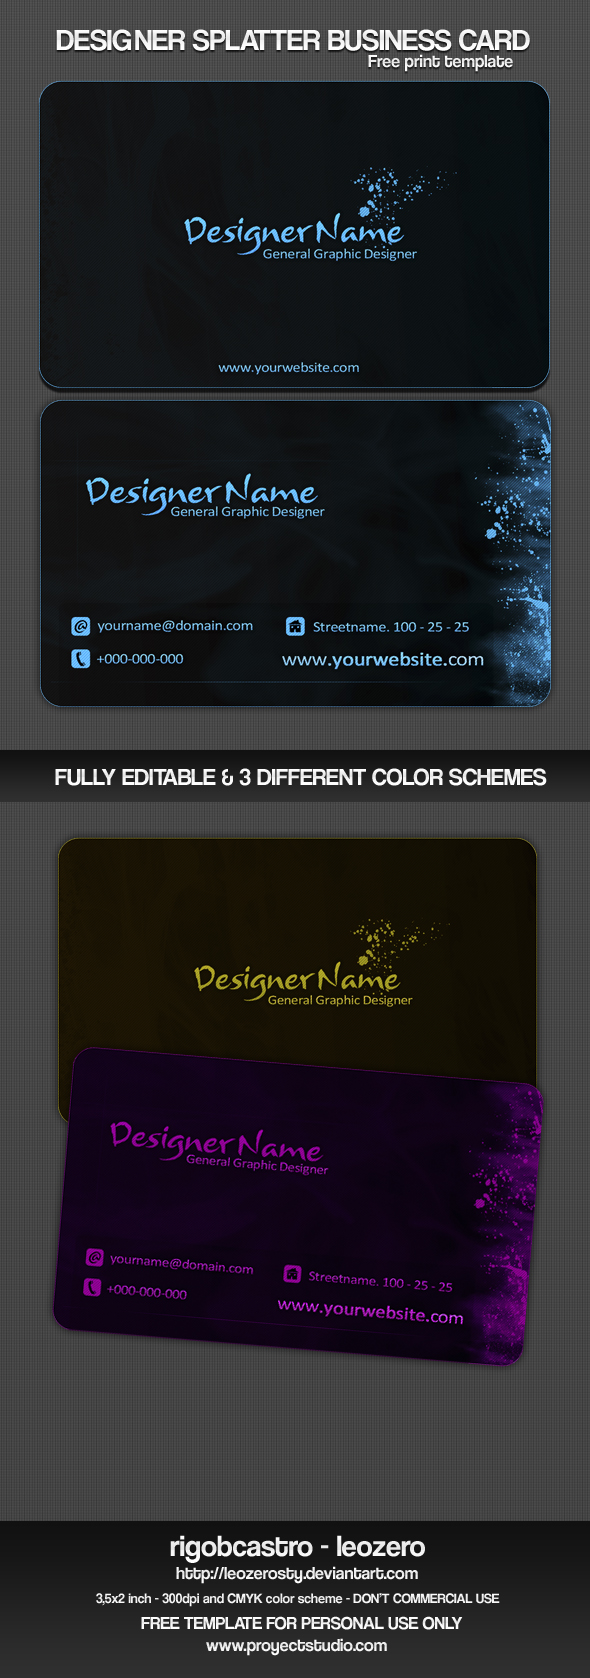 DS Business Card Template by leozerosty